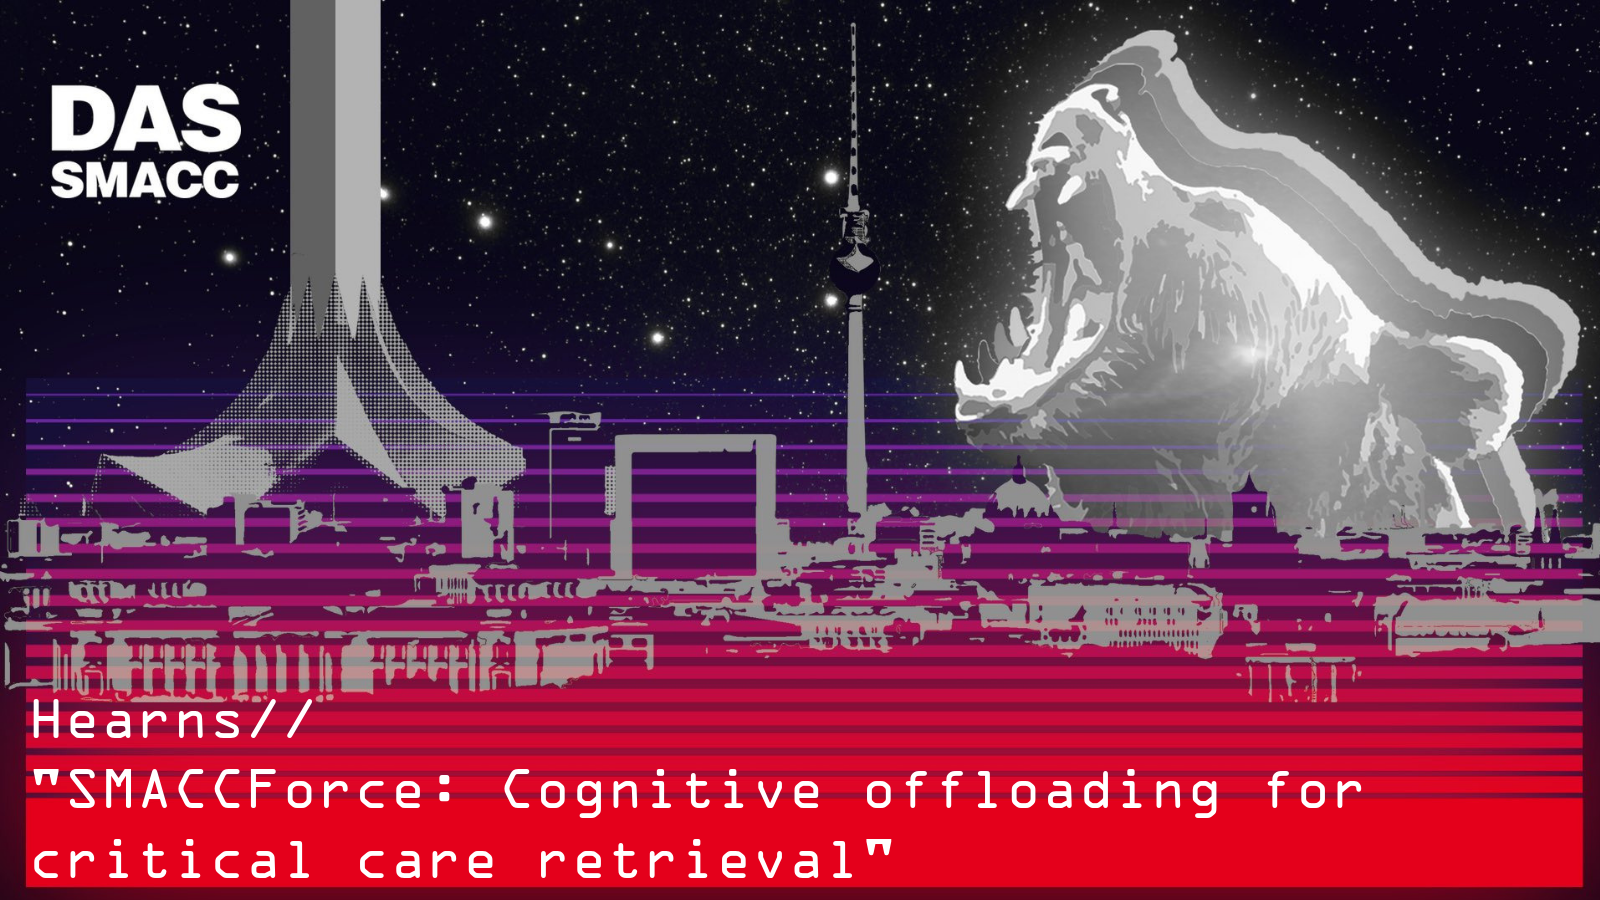 Cognitive offloading for critical care retrieval